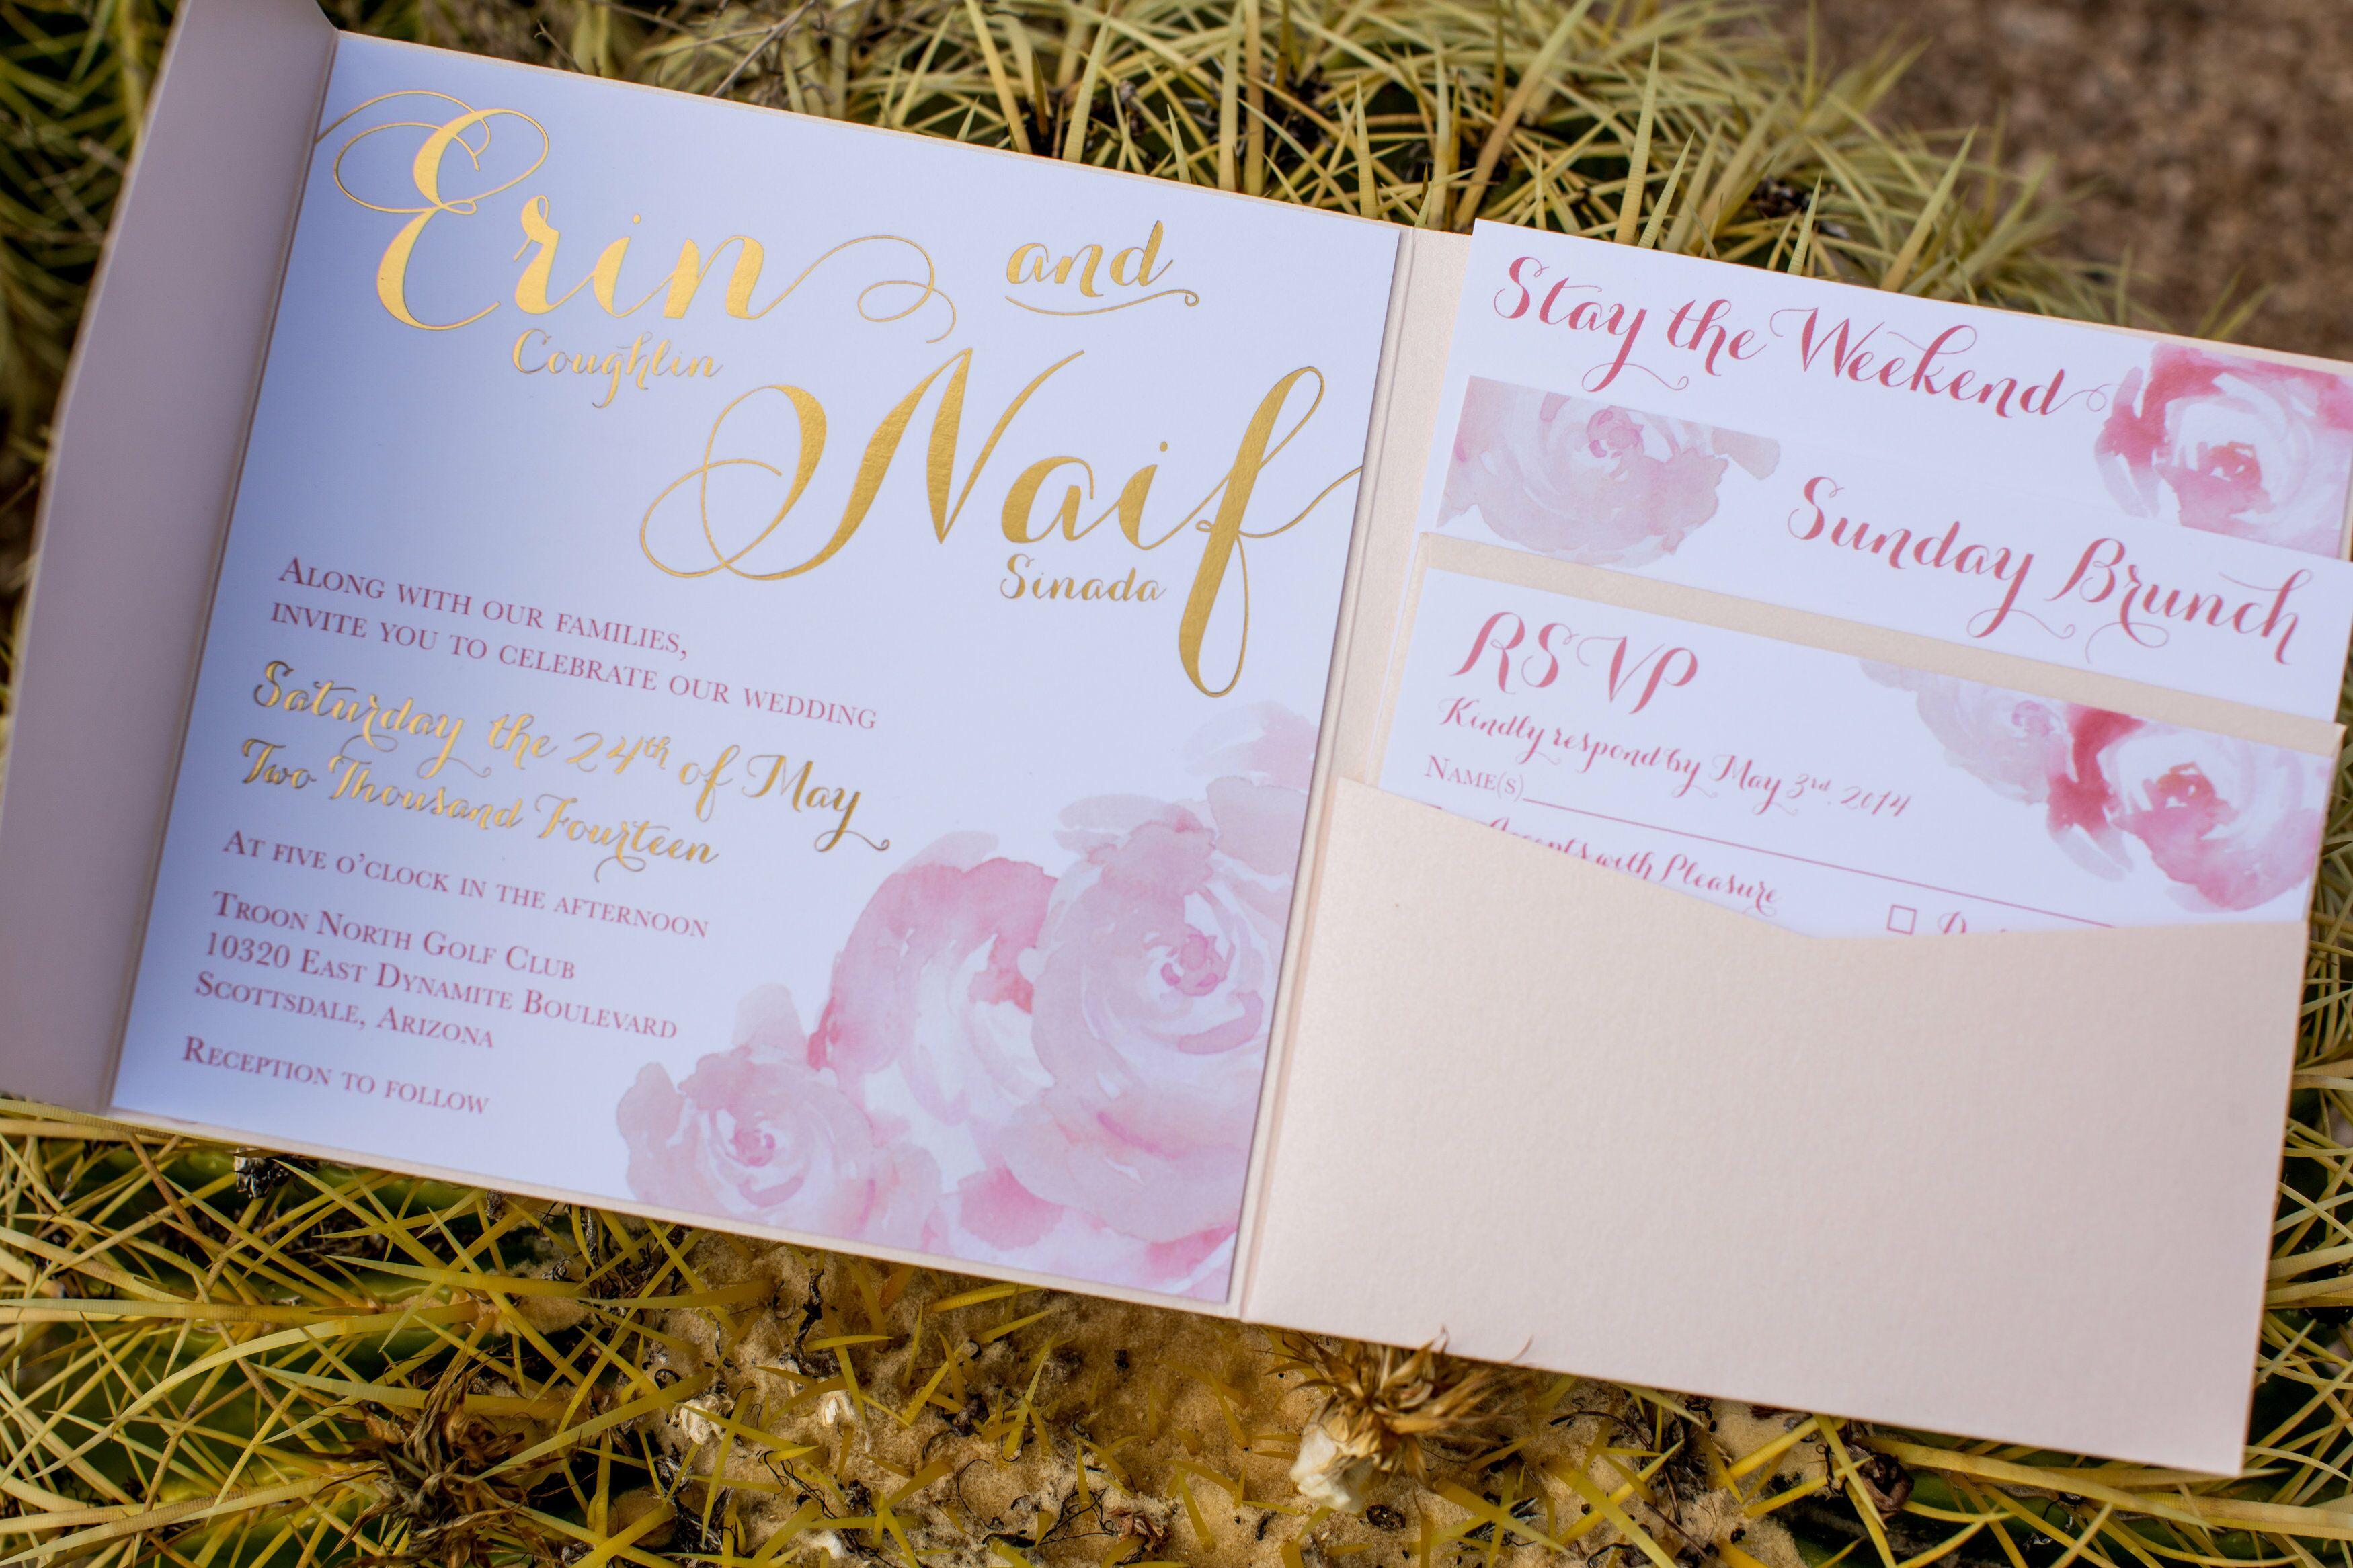 Wedding Invitations Az: Blush And Metallic Gold Invitation For Arizona Desert Wedding